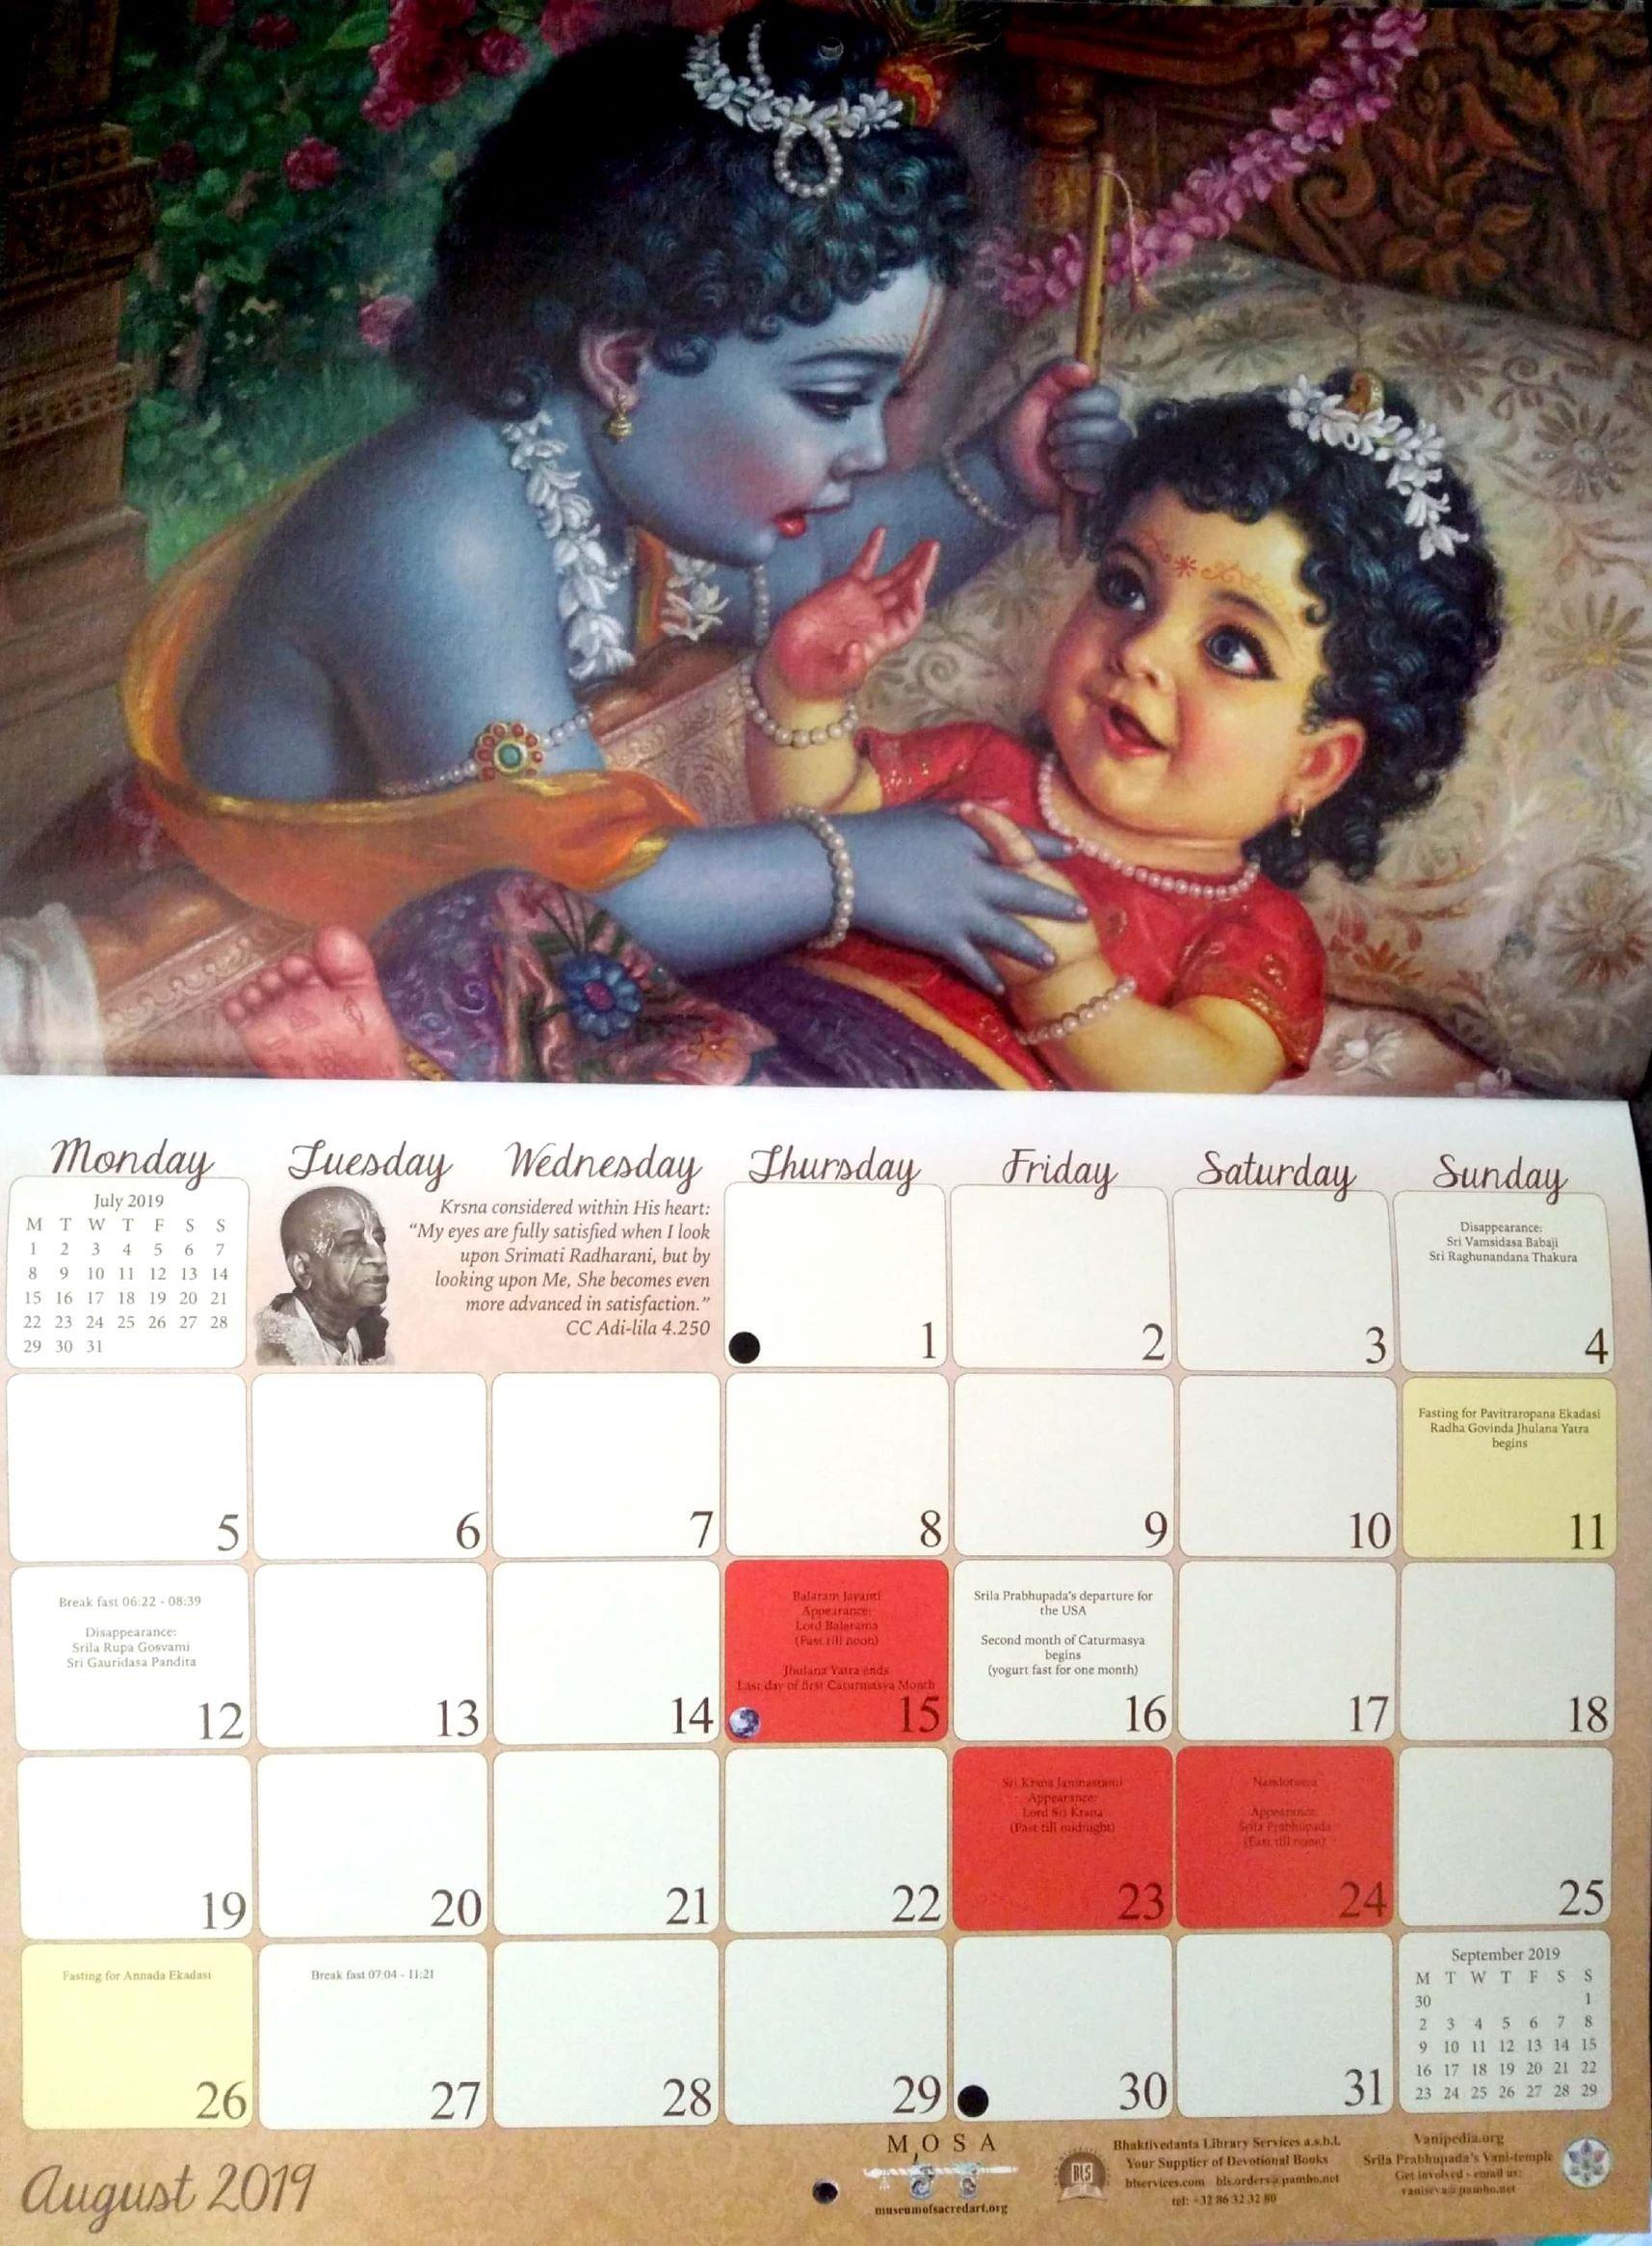 Hare Krishna Calendar 2019 | Bhaktivedanta Library Services Bb&t Calendar 2019